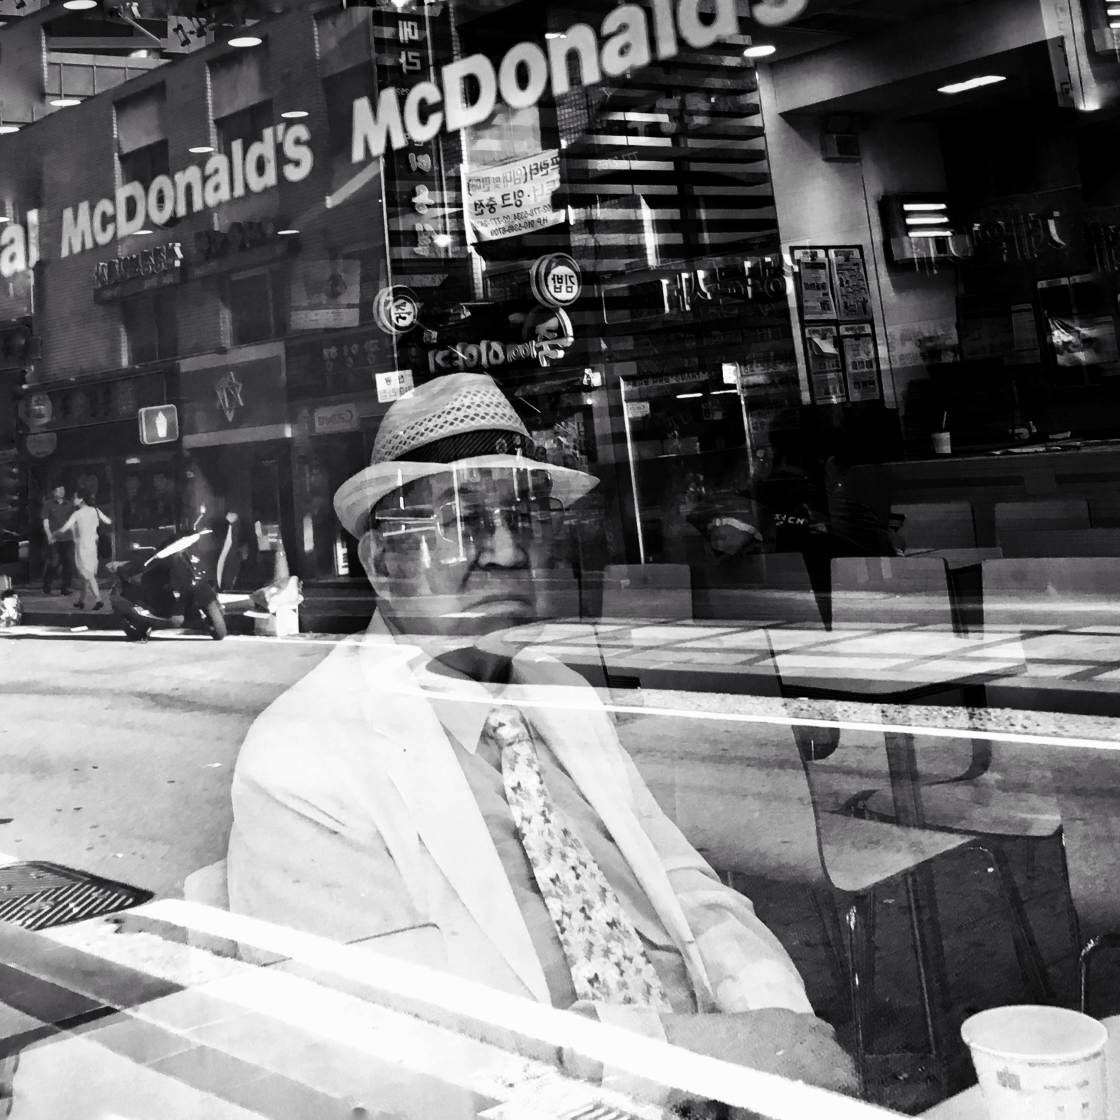 creative street photography